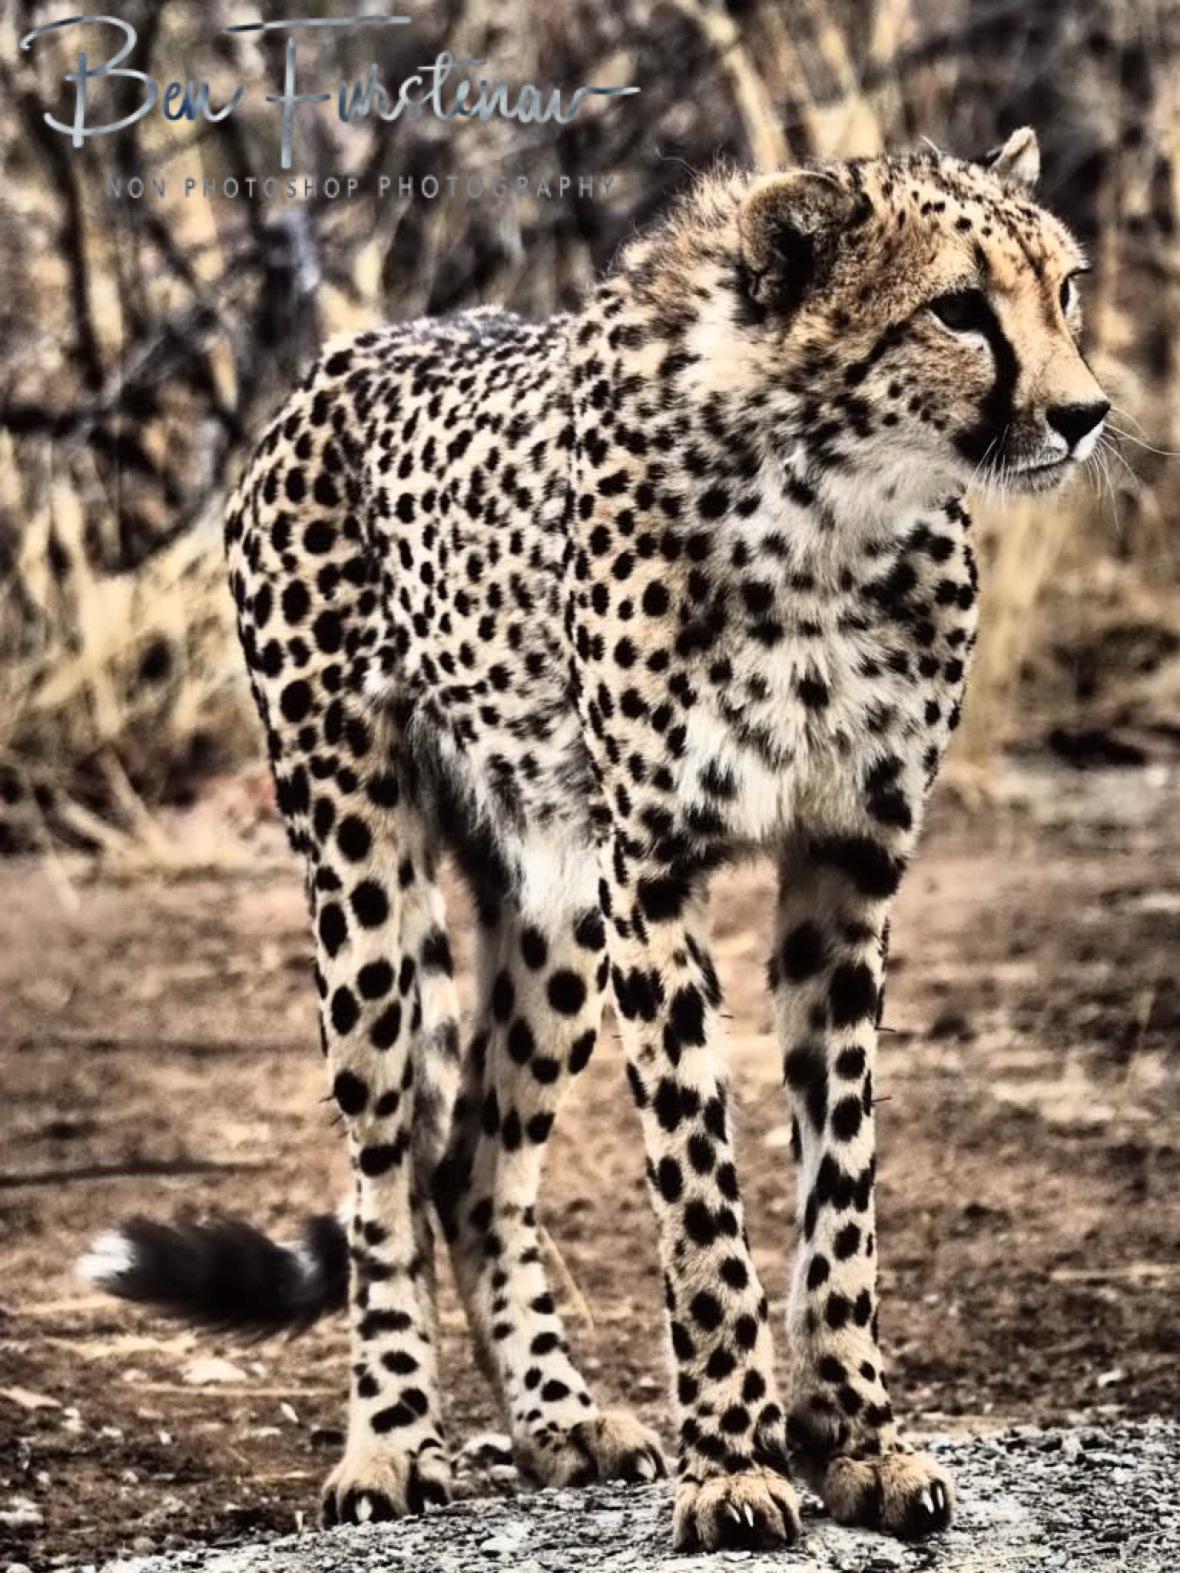 Graceful cheetah, Sophienhof, Outjo, Namibia